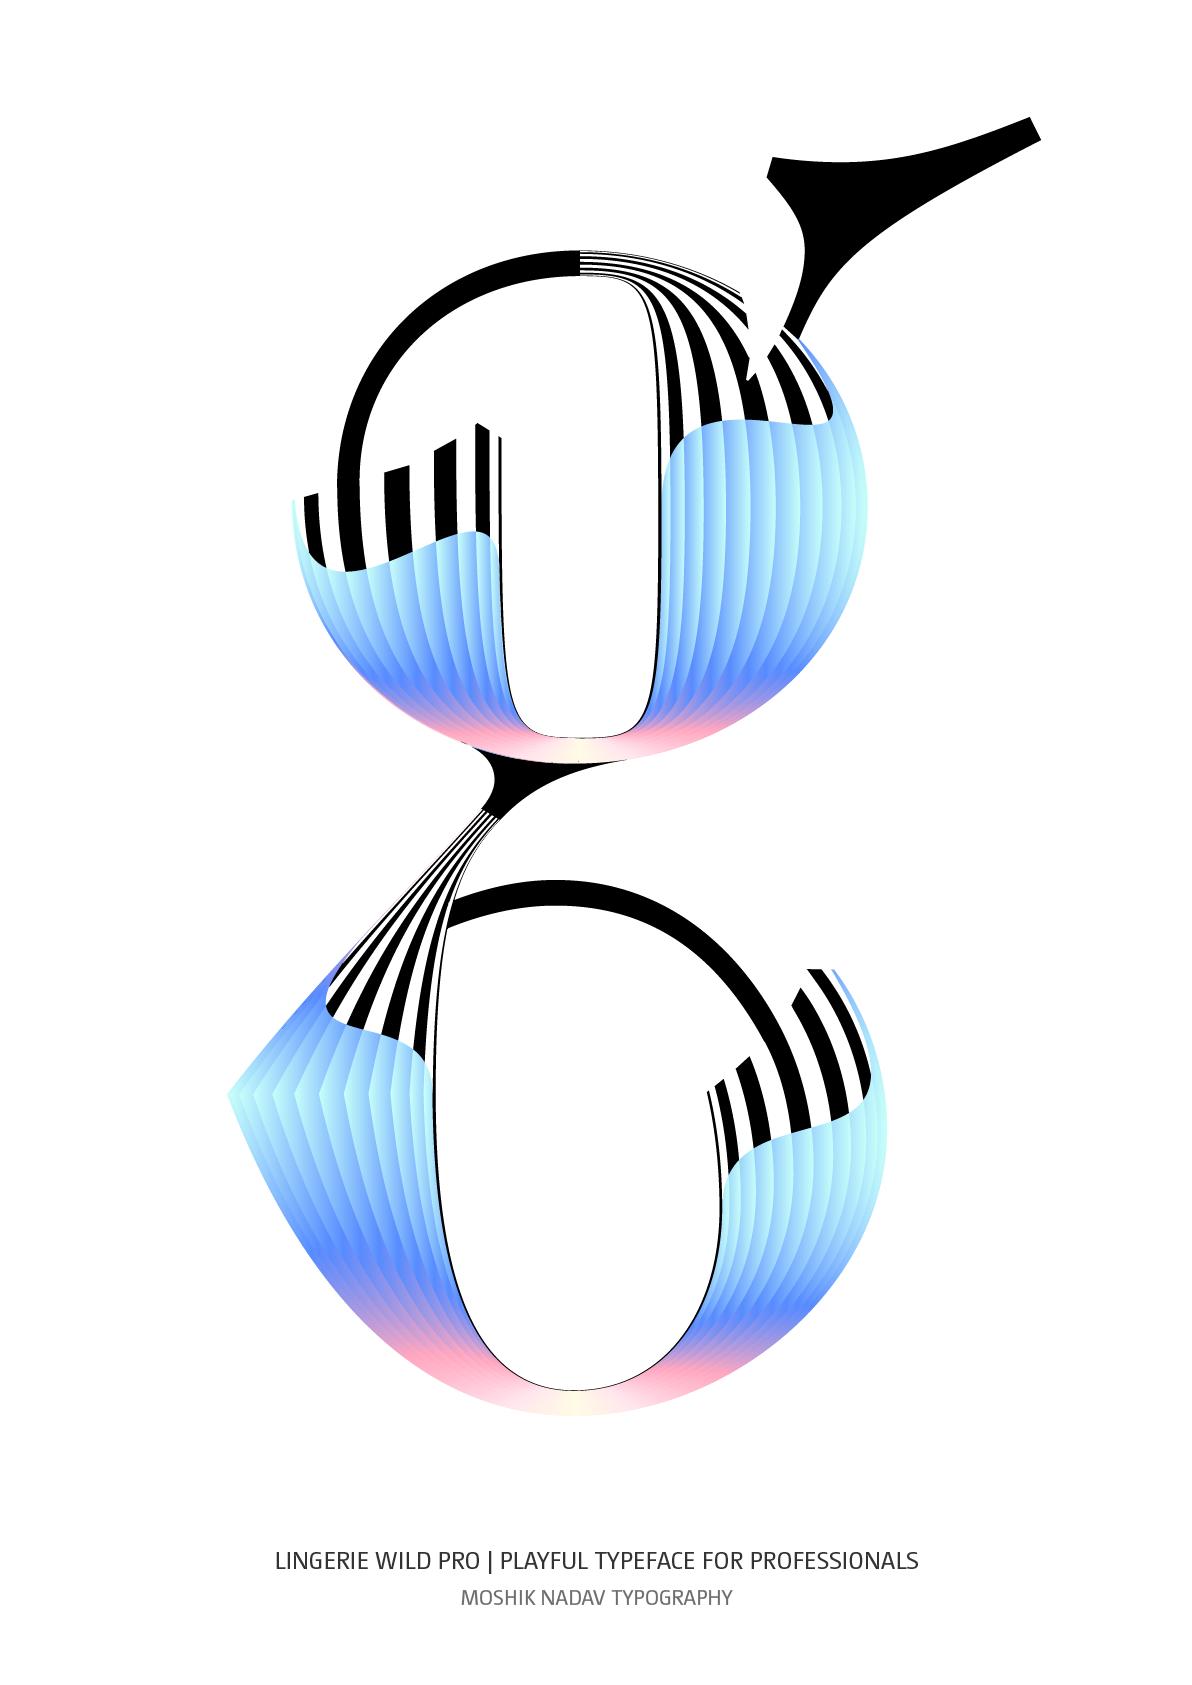 Moshik Nadav Typography Graphic Design Blog In 2020 Graphic Design Blog Graphic Design Typography Typeface Logo